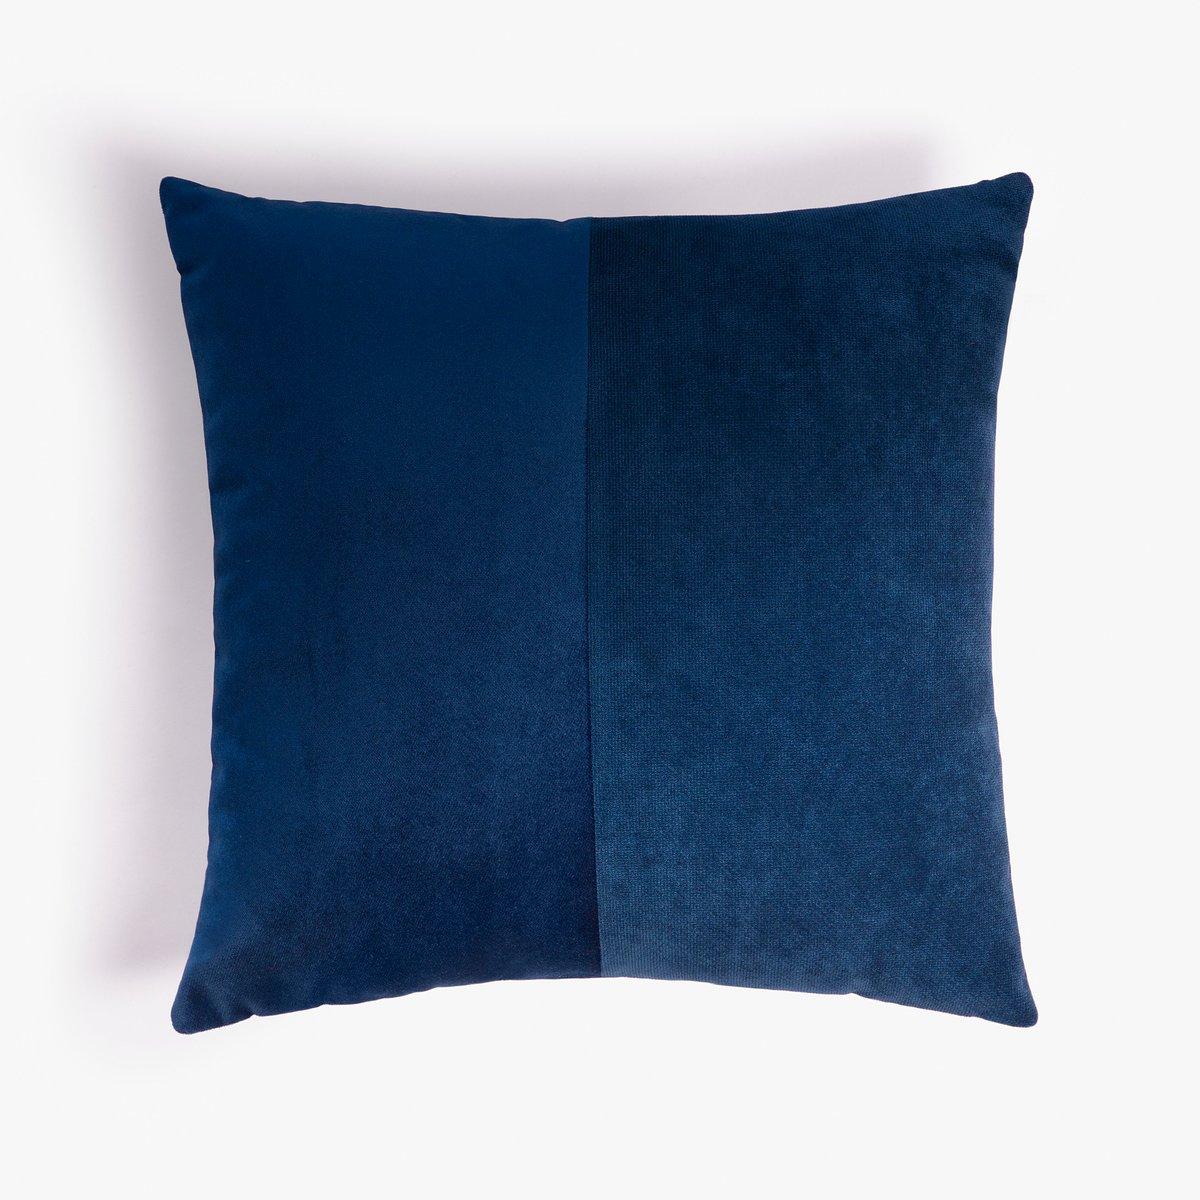 double blue velvet cushion cover by lorenza briola